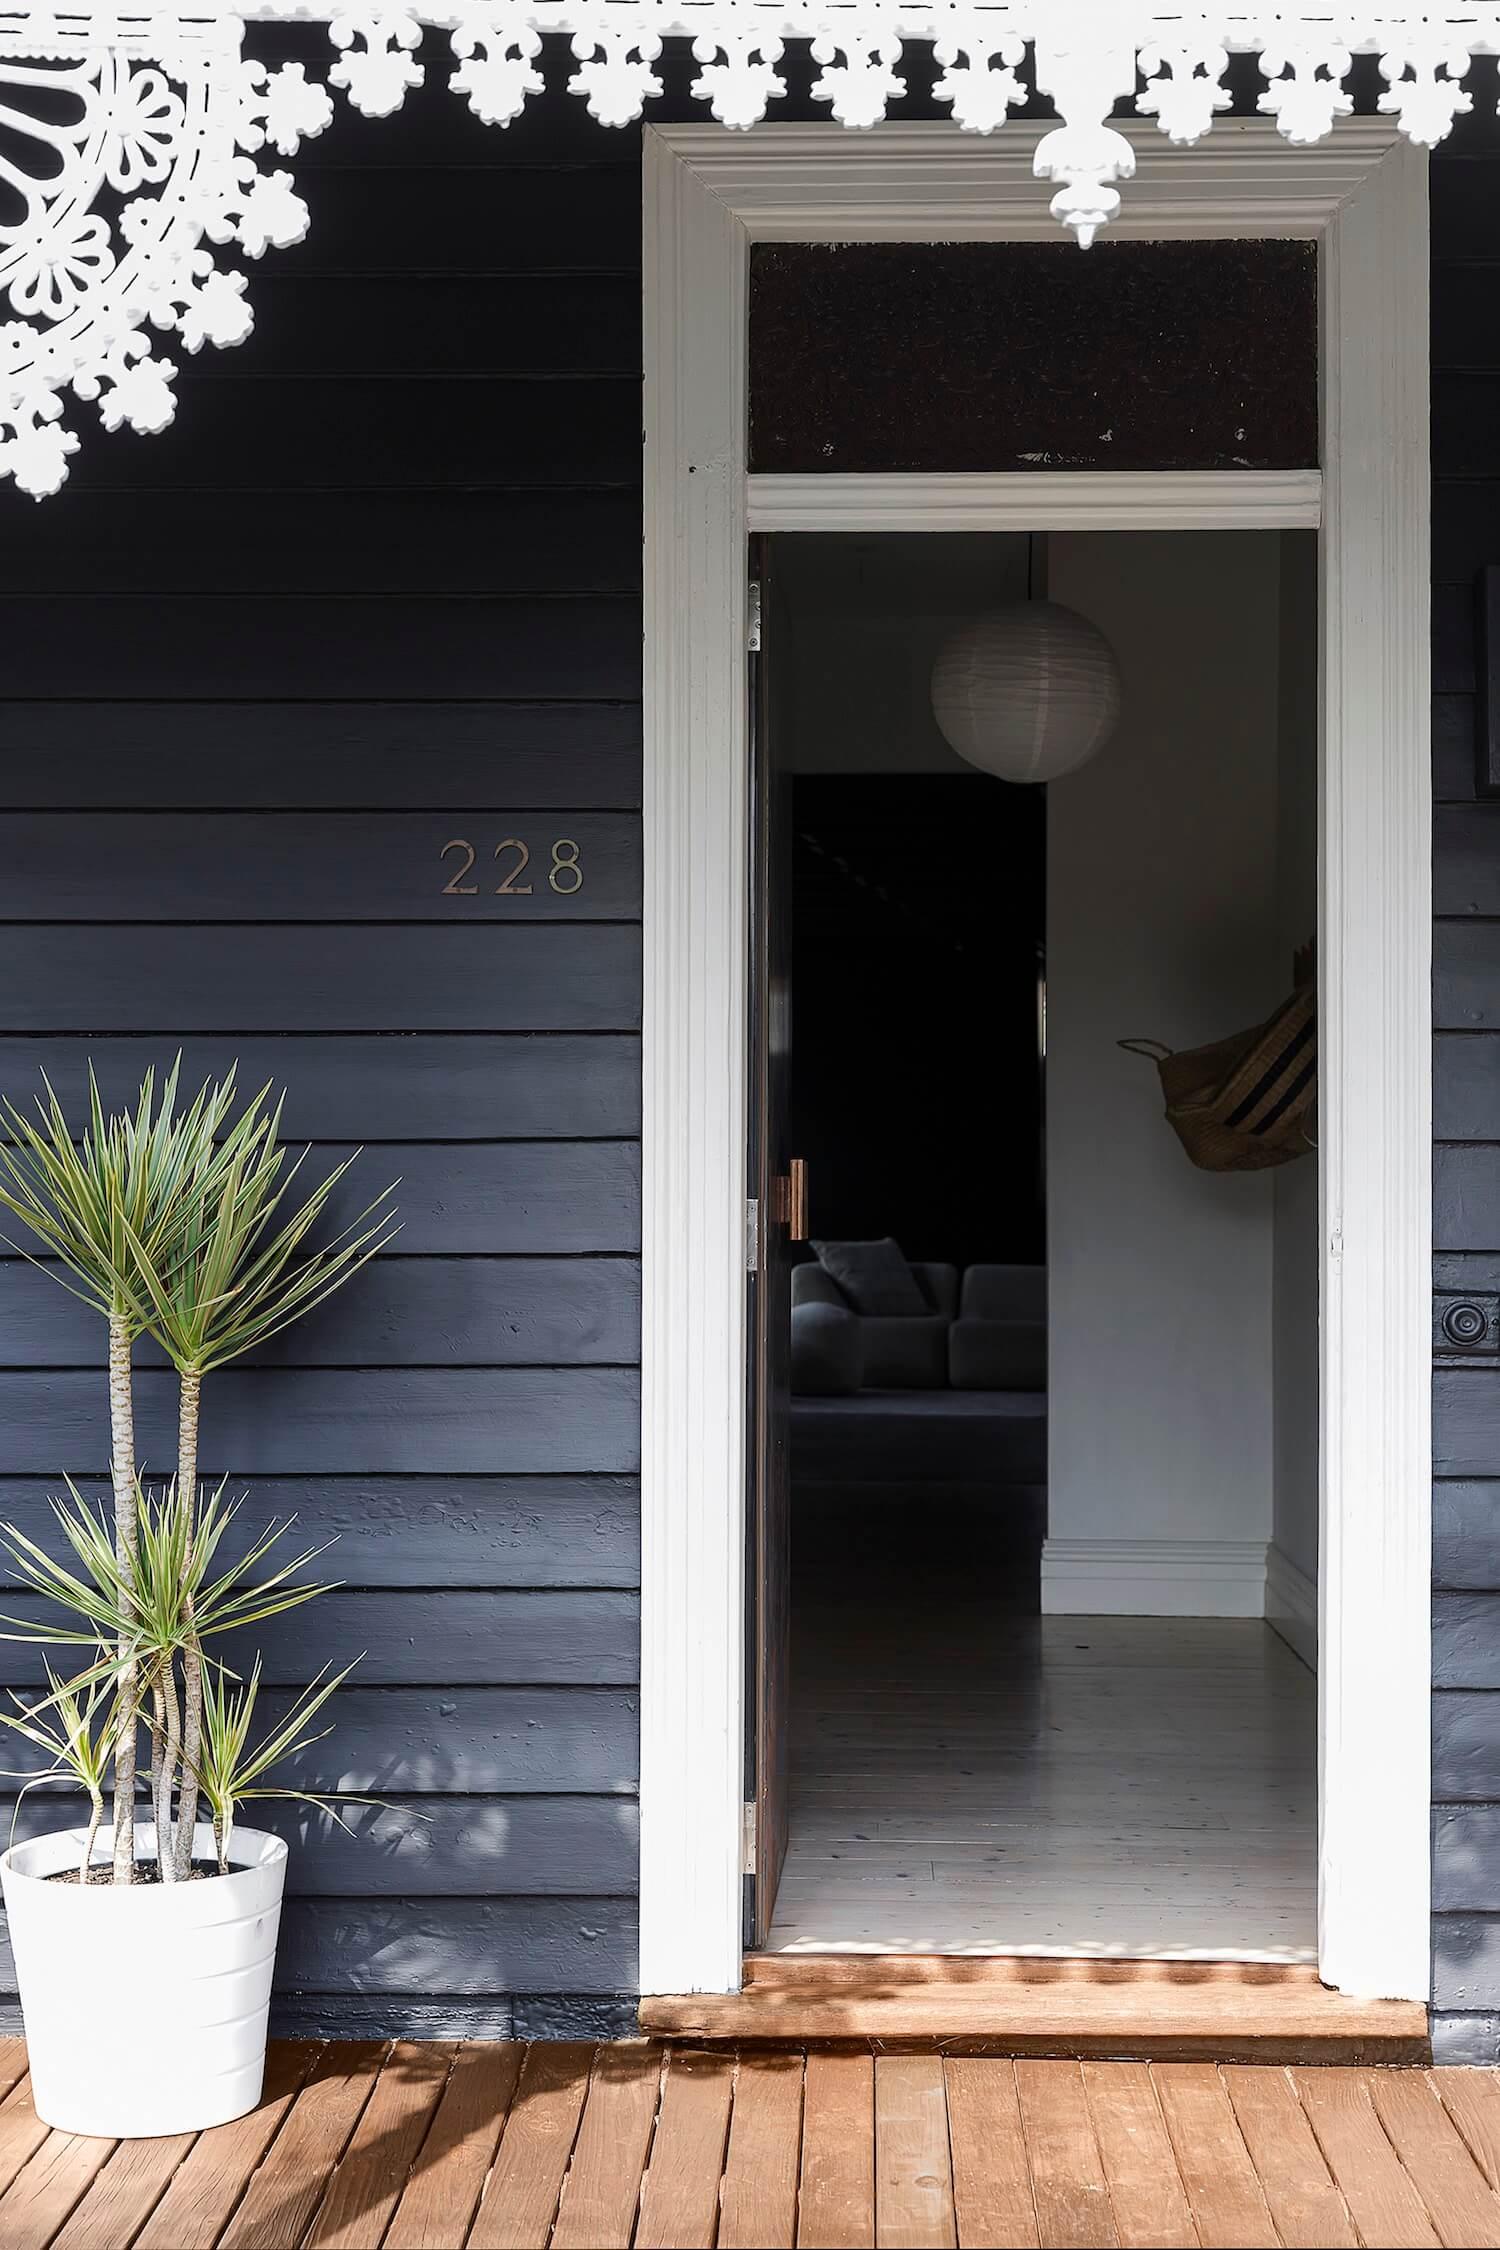 est living open house 228 edward street brunswick east 3